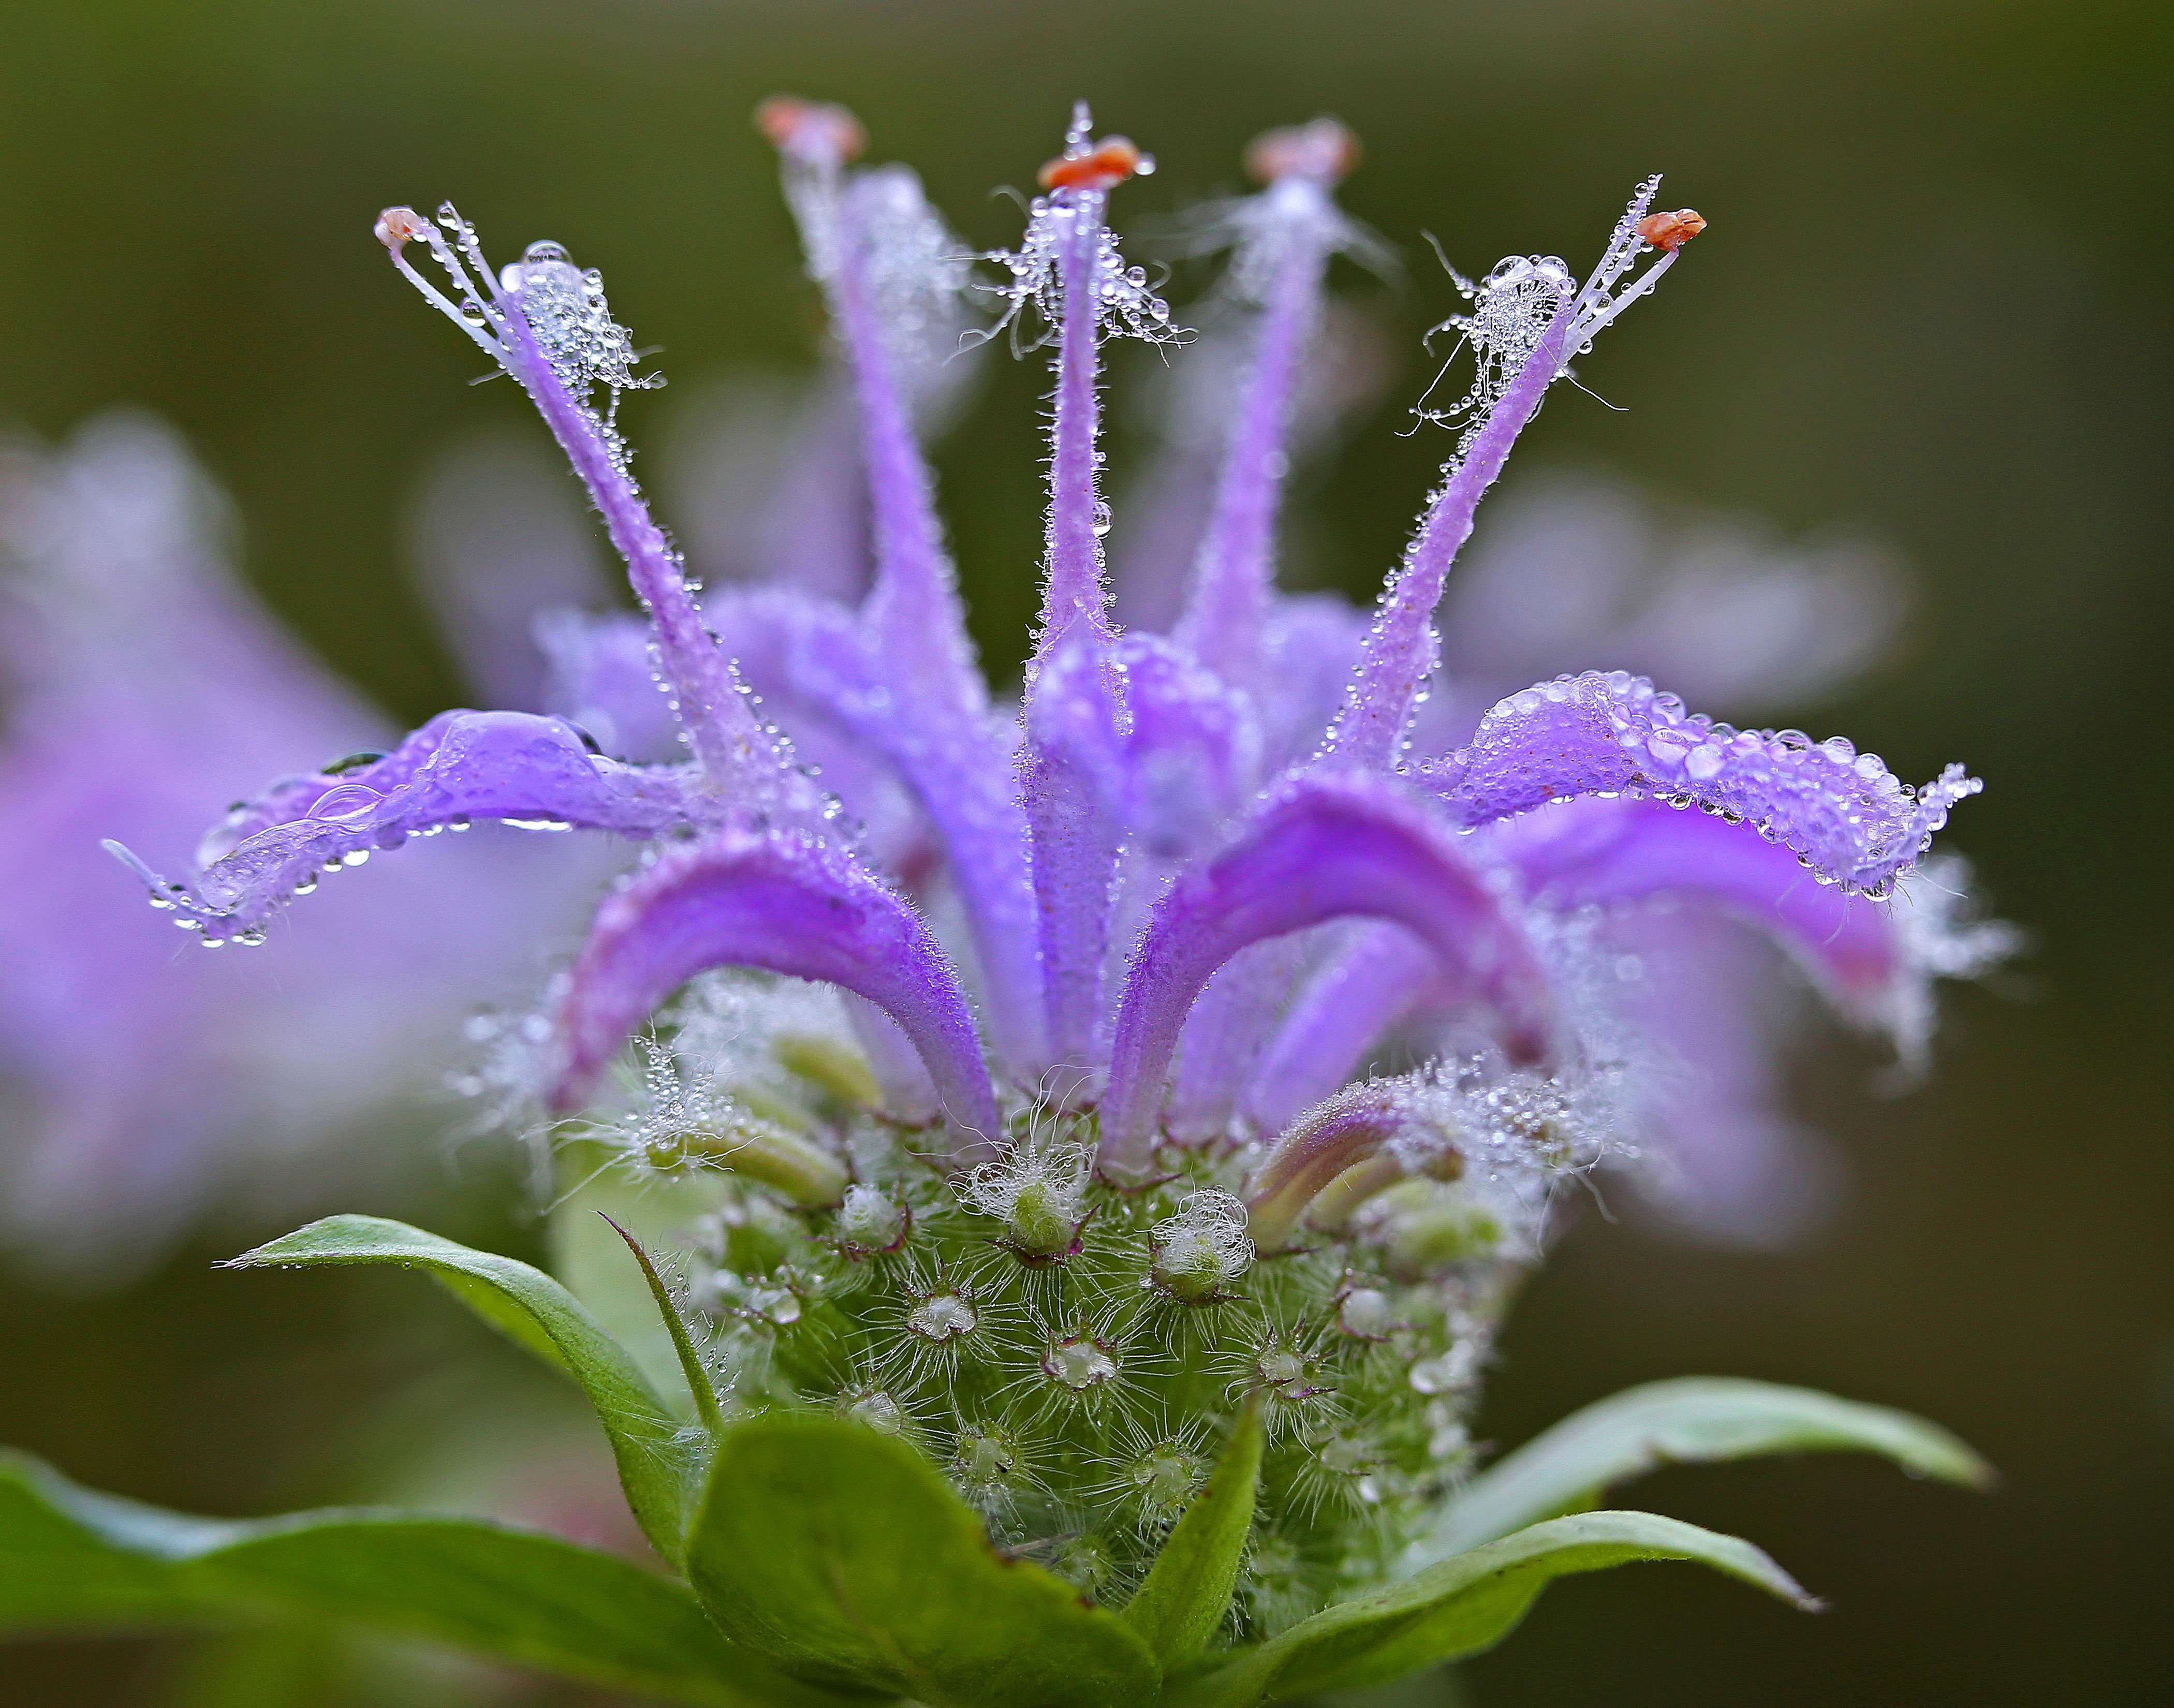 Monarda fistulosa wild native bee balm beautiful dew and colors